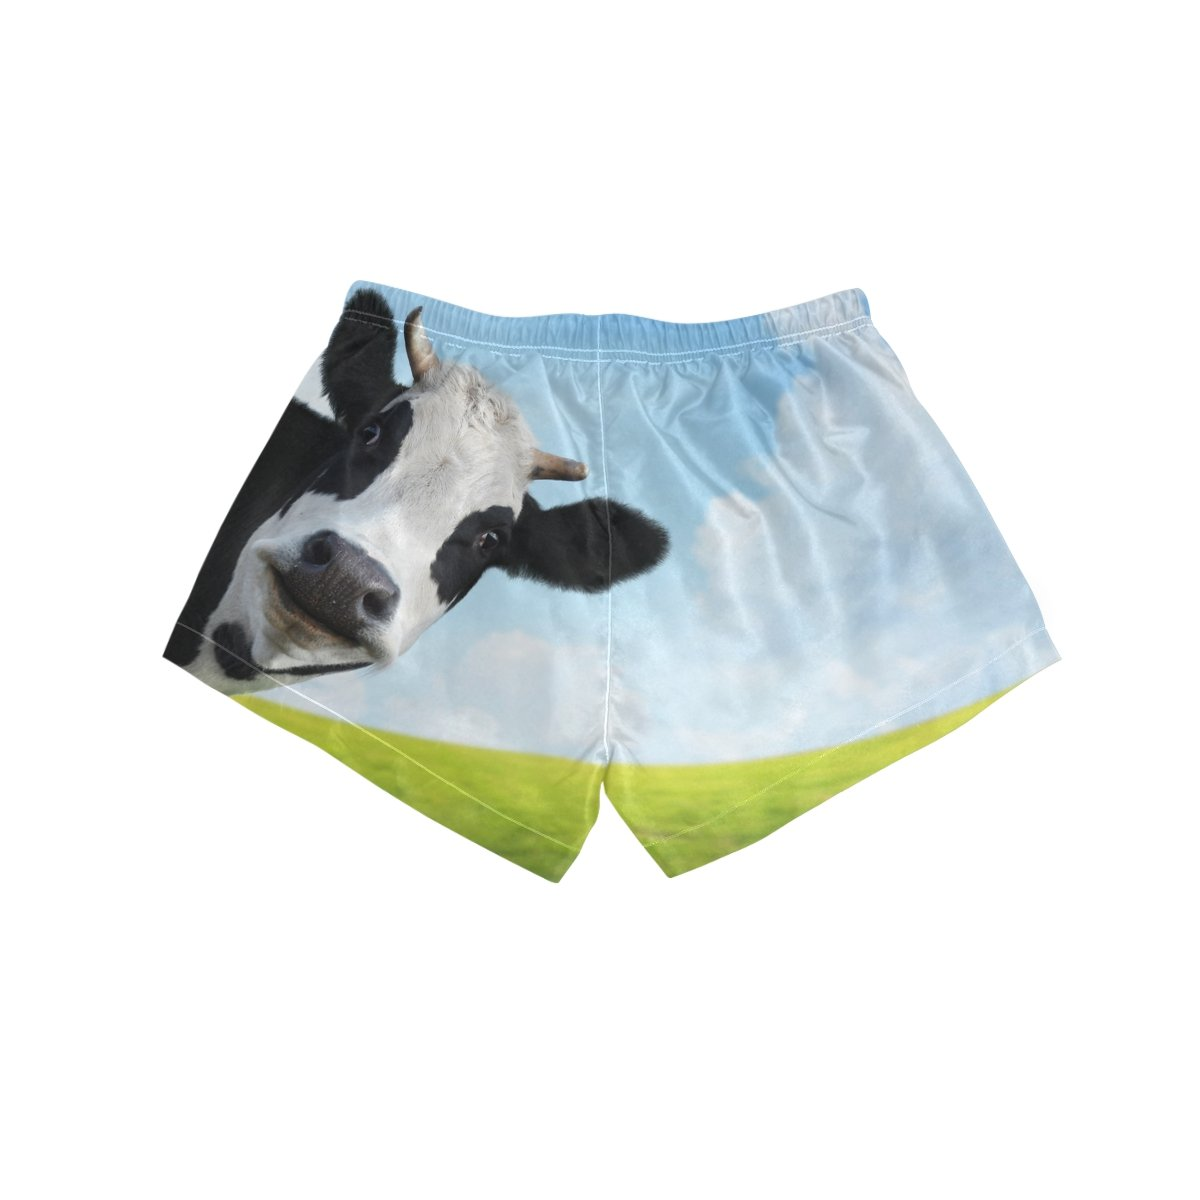 Cooper girl ALAZA Funny Cow Womens Shorts Beach Summer Drawstring Casual Shorts